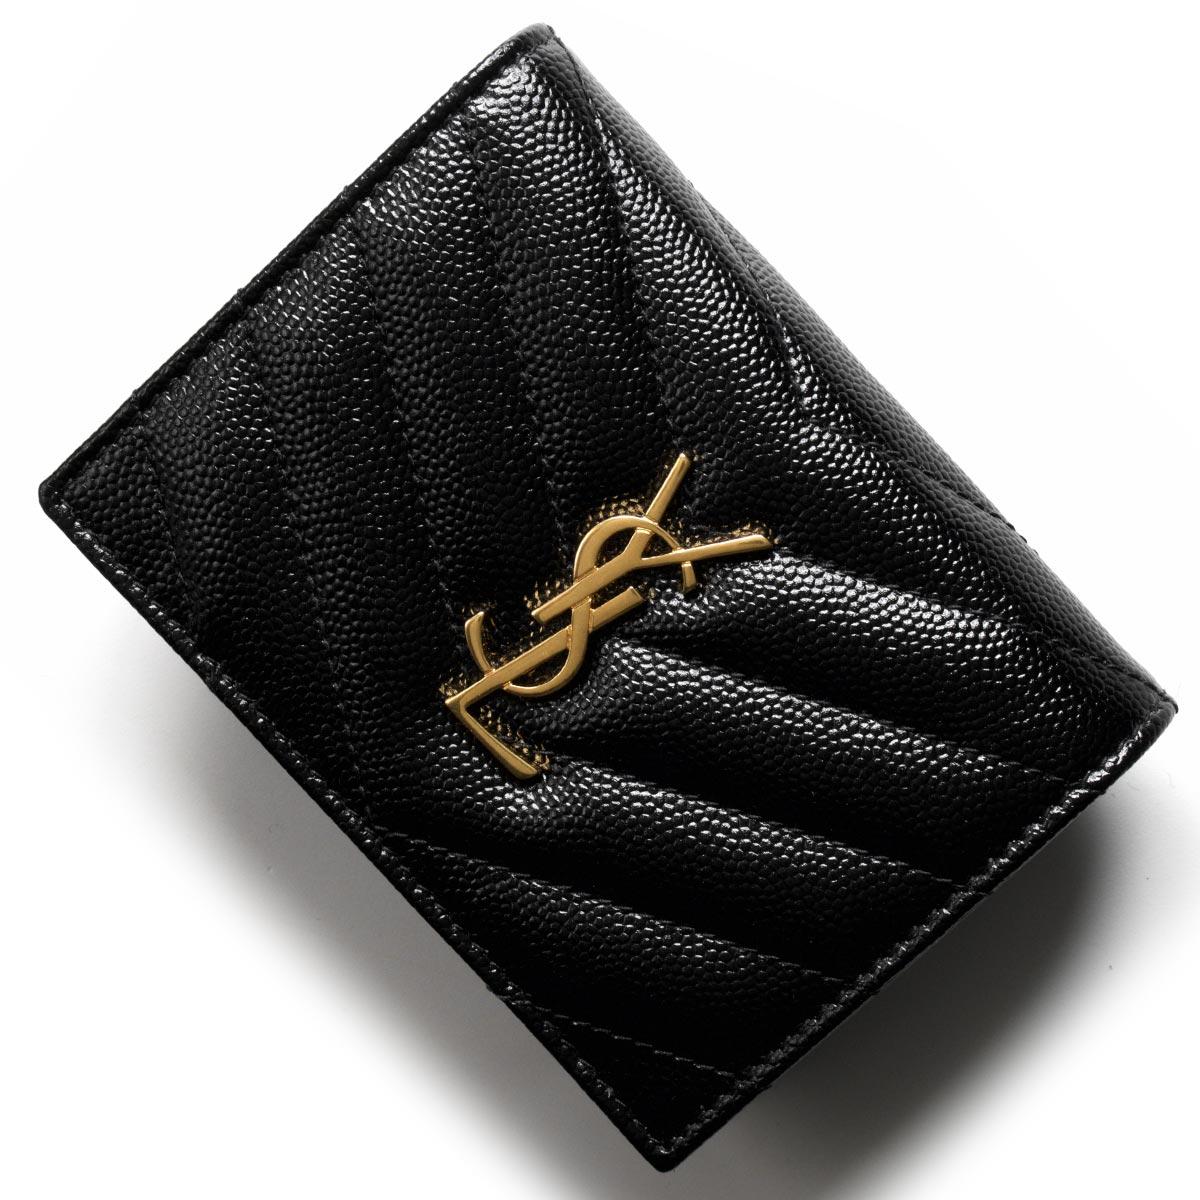 1e2cbcc6935b ... 財布 | 長財布 | サンローランパリ イヴサンローラン 財布 二つ折り財布 財布 レディース モノグラム YSL ブラック 530841  BOWA1 1000 SAINT LAURENT PARIS